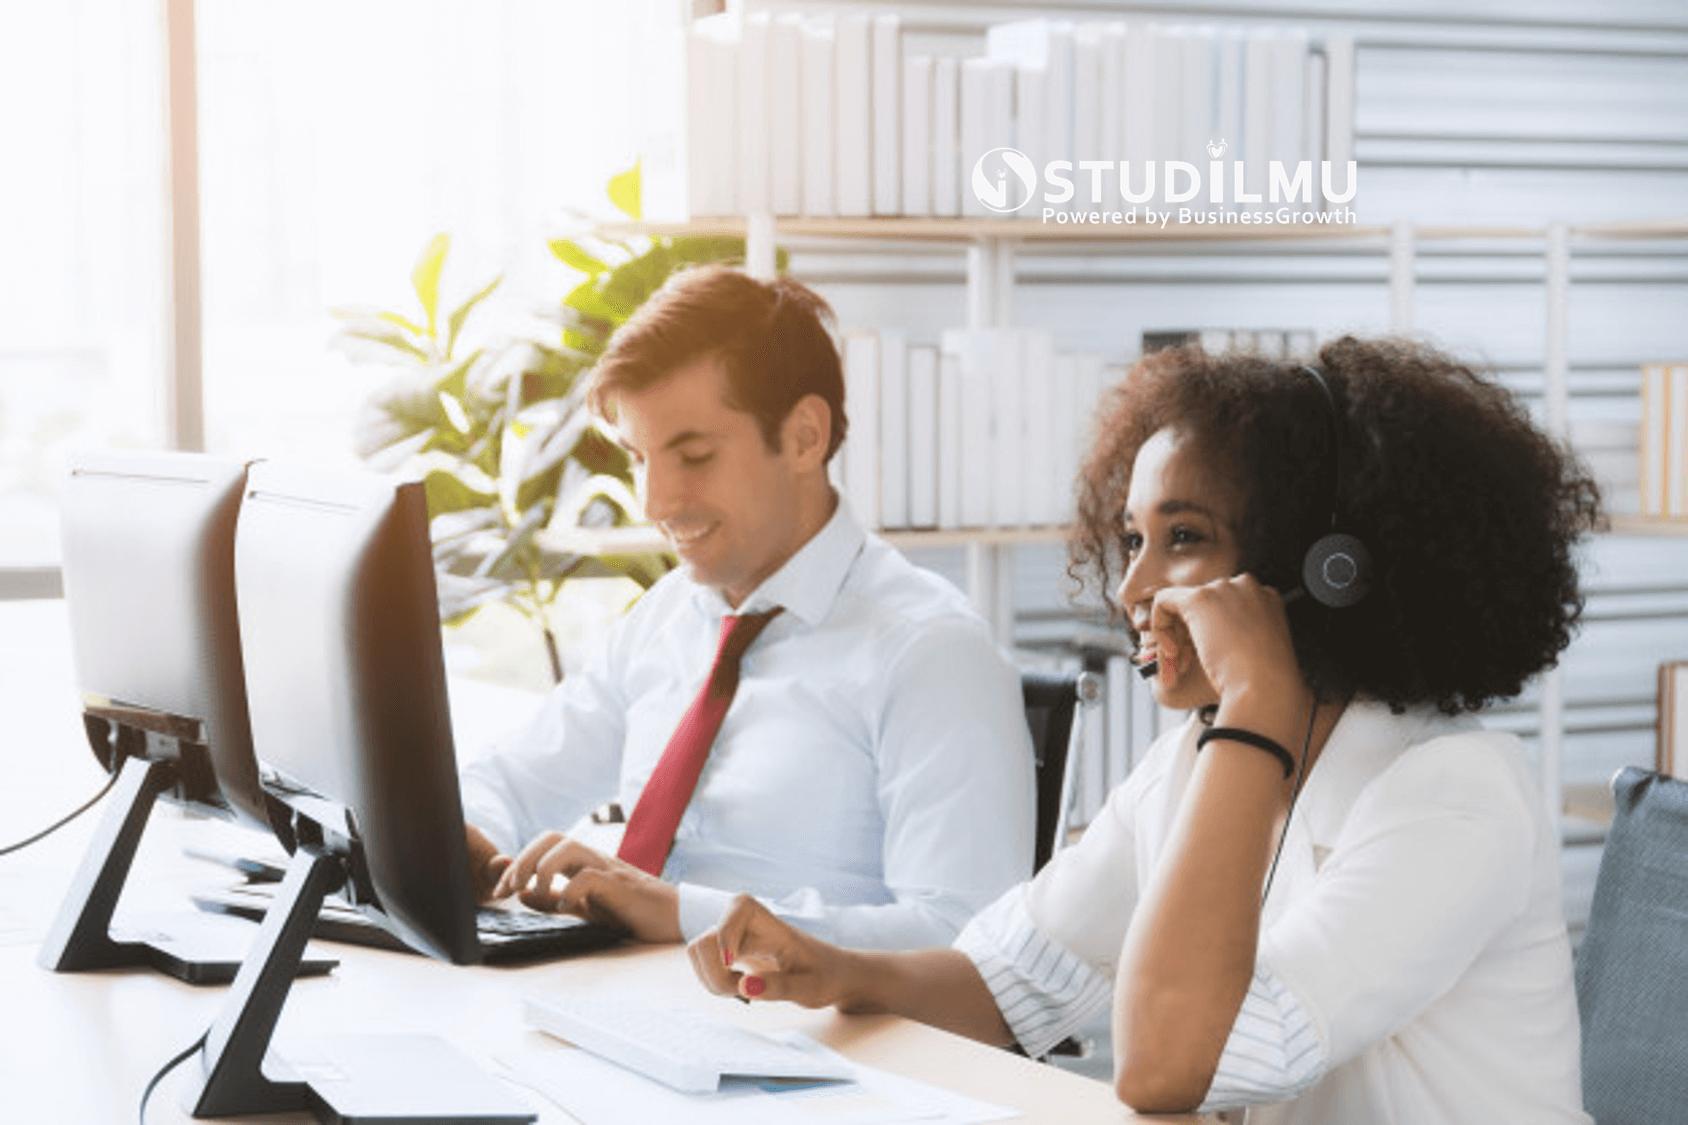 STUDILMU Career Advice - 4 Jenis Customer Service dan Cara Memaksimalkannya